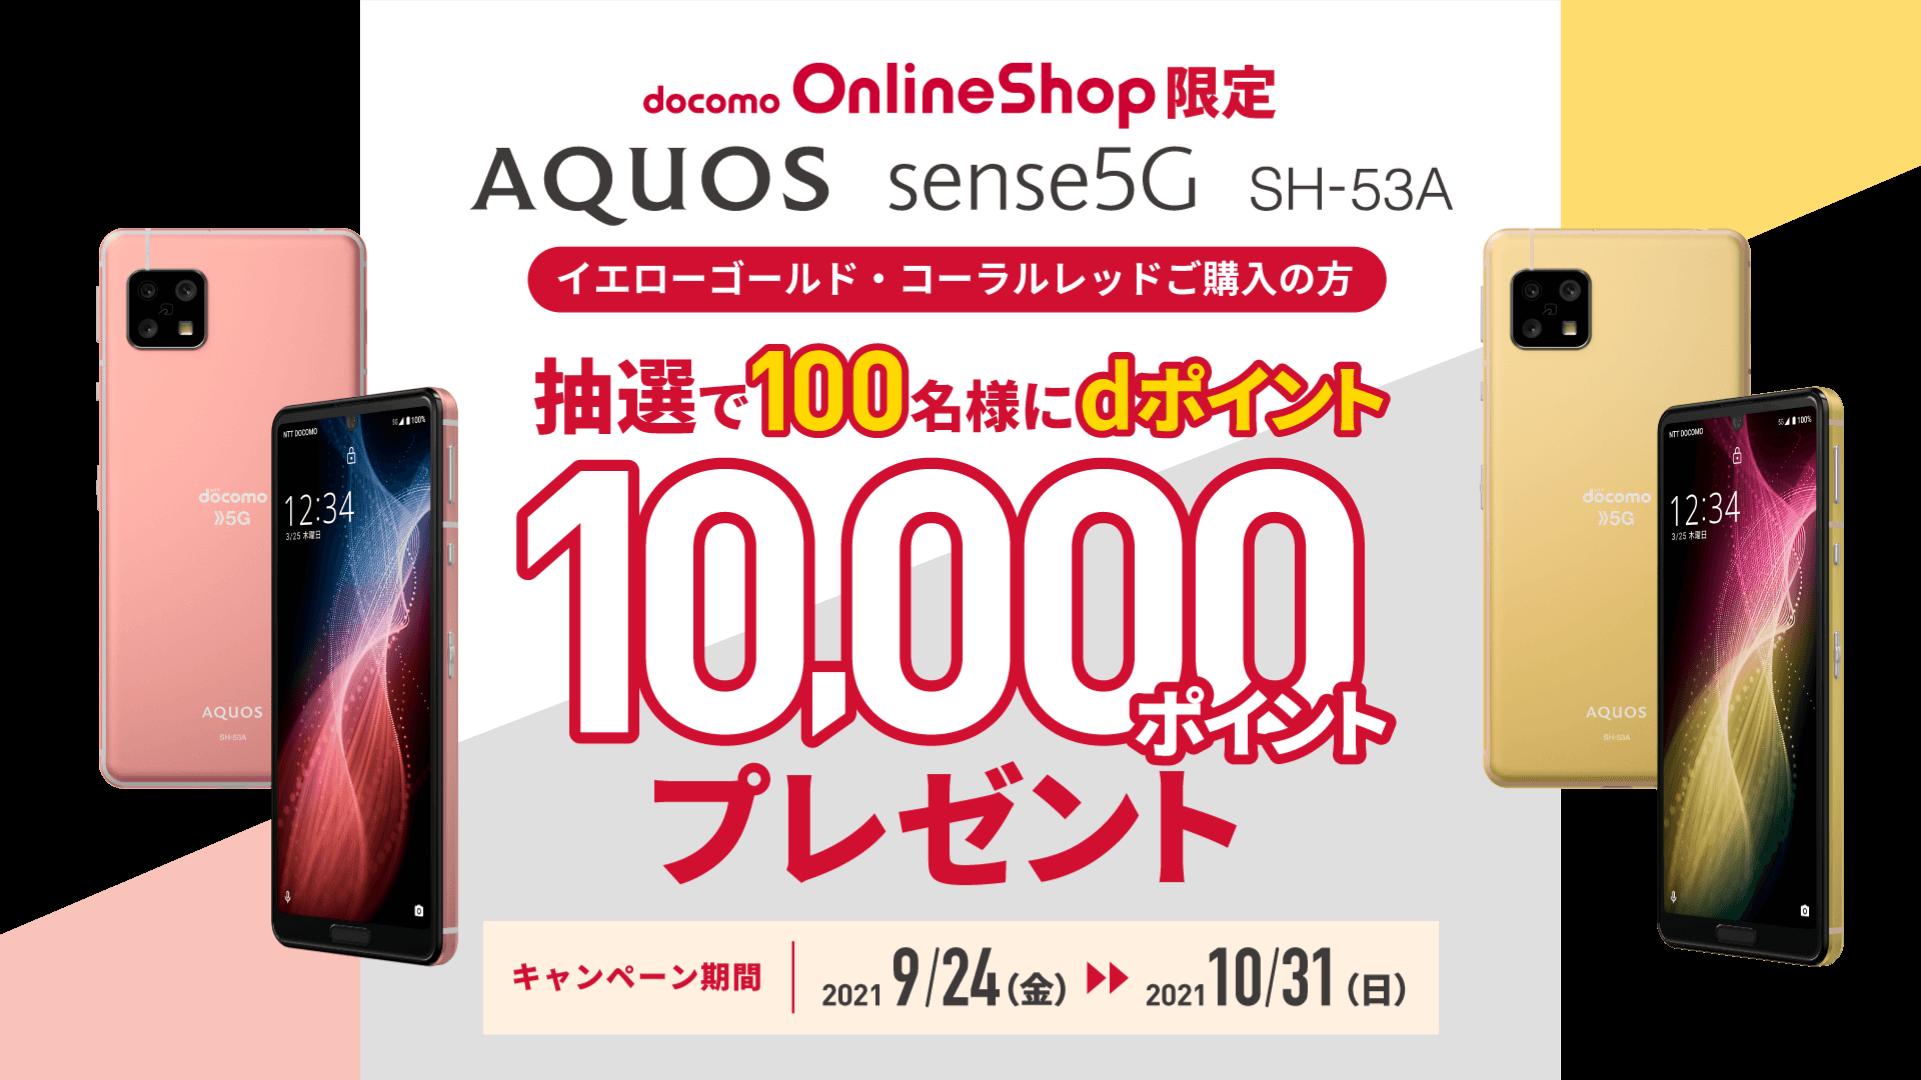 AQUOS sense5G オンラインショップ限定キャンペーン